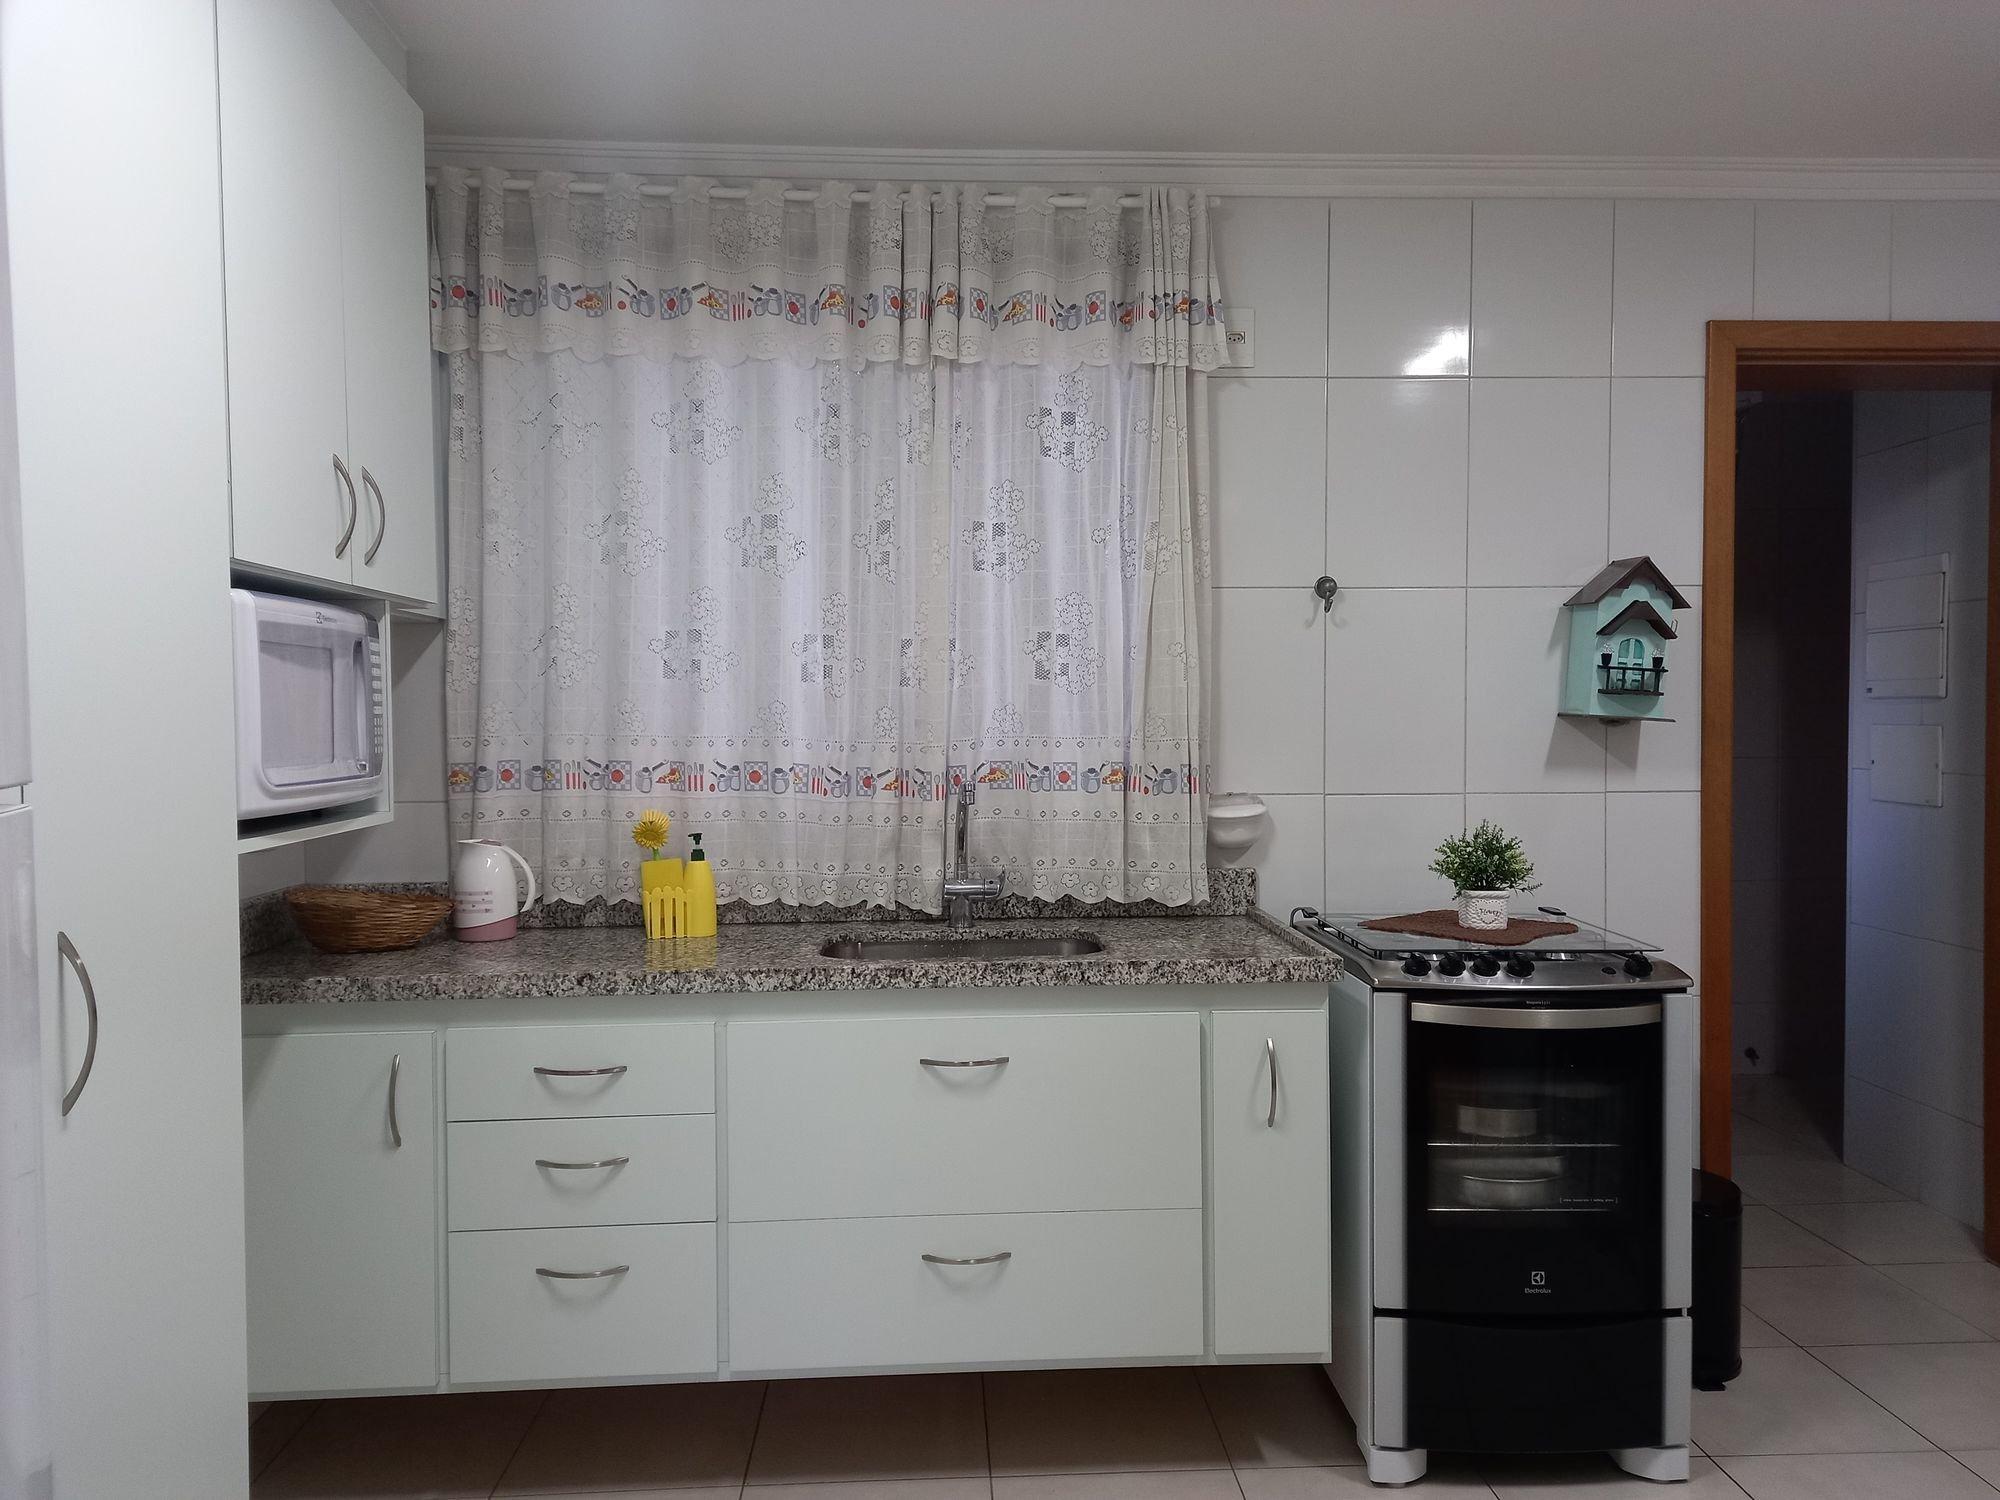 Foto de Cozinha com vaso de planta, vaso, garrafa, forno, tigela